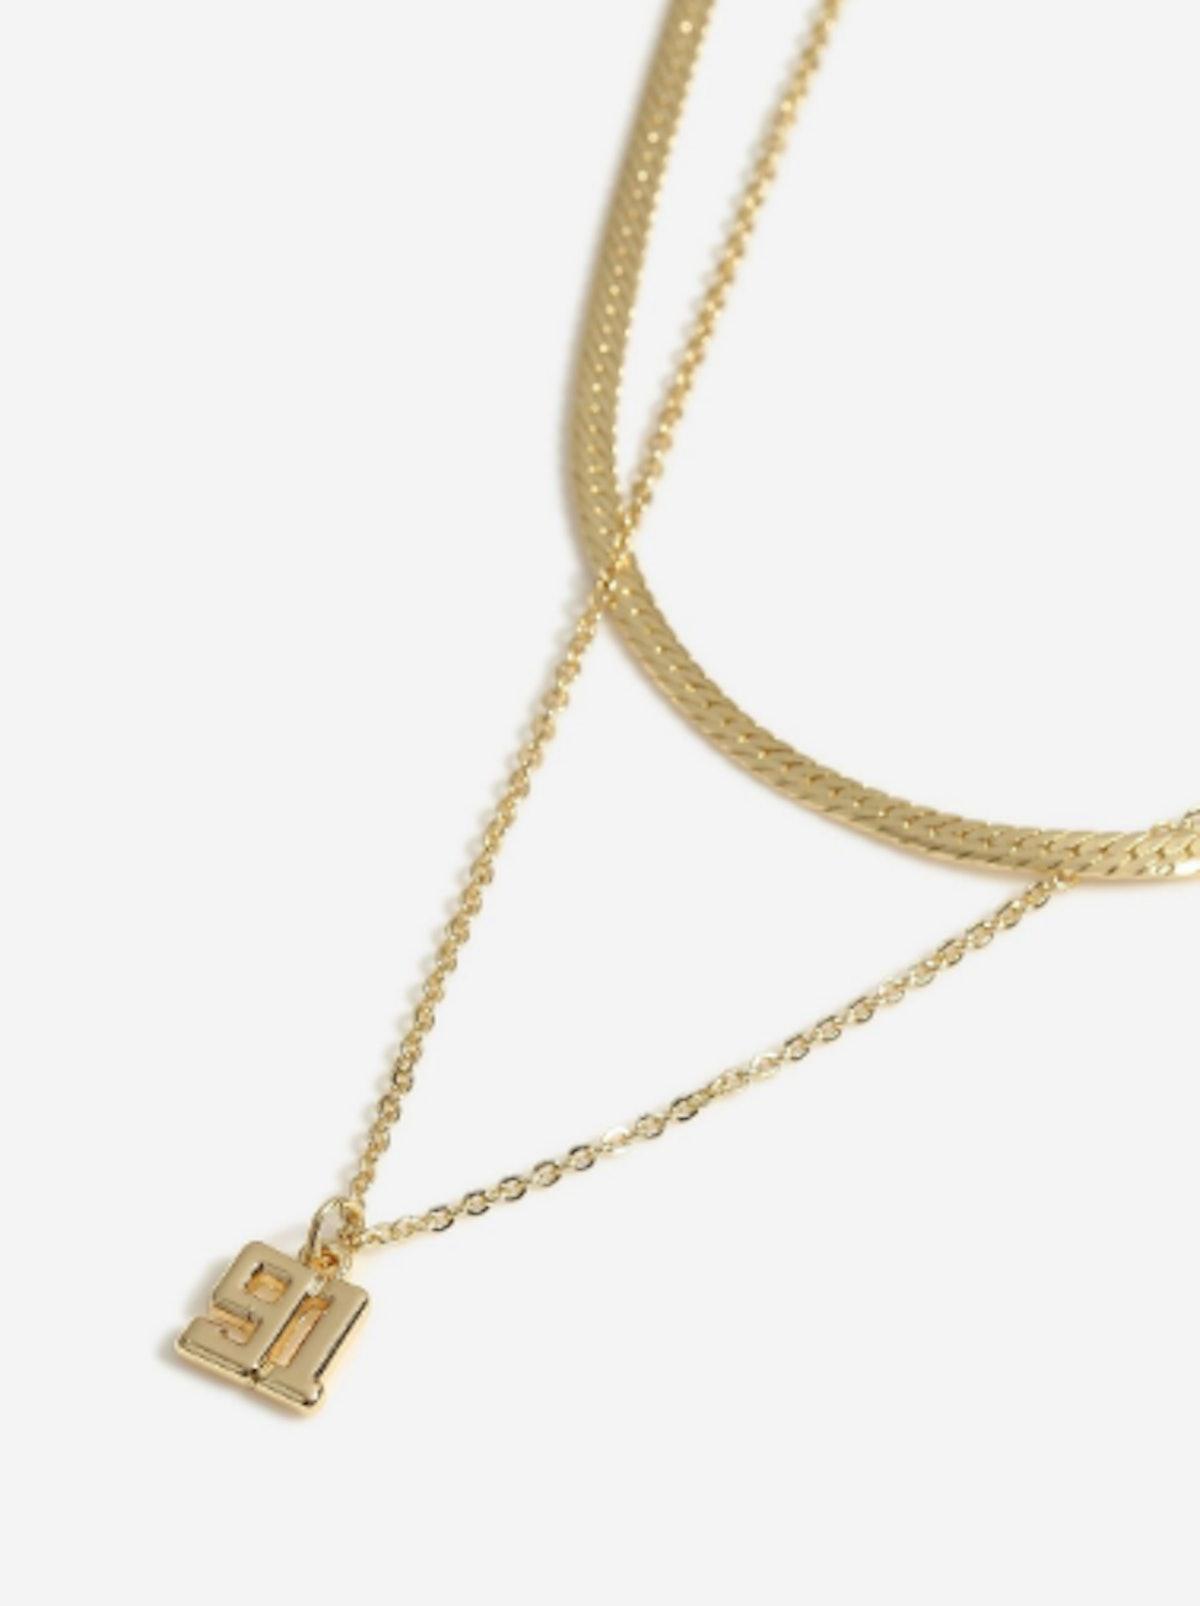 91 Multirow Necklace